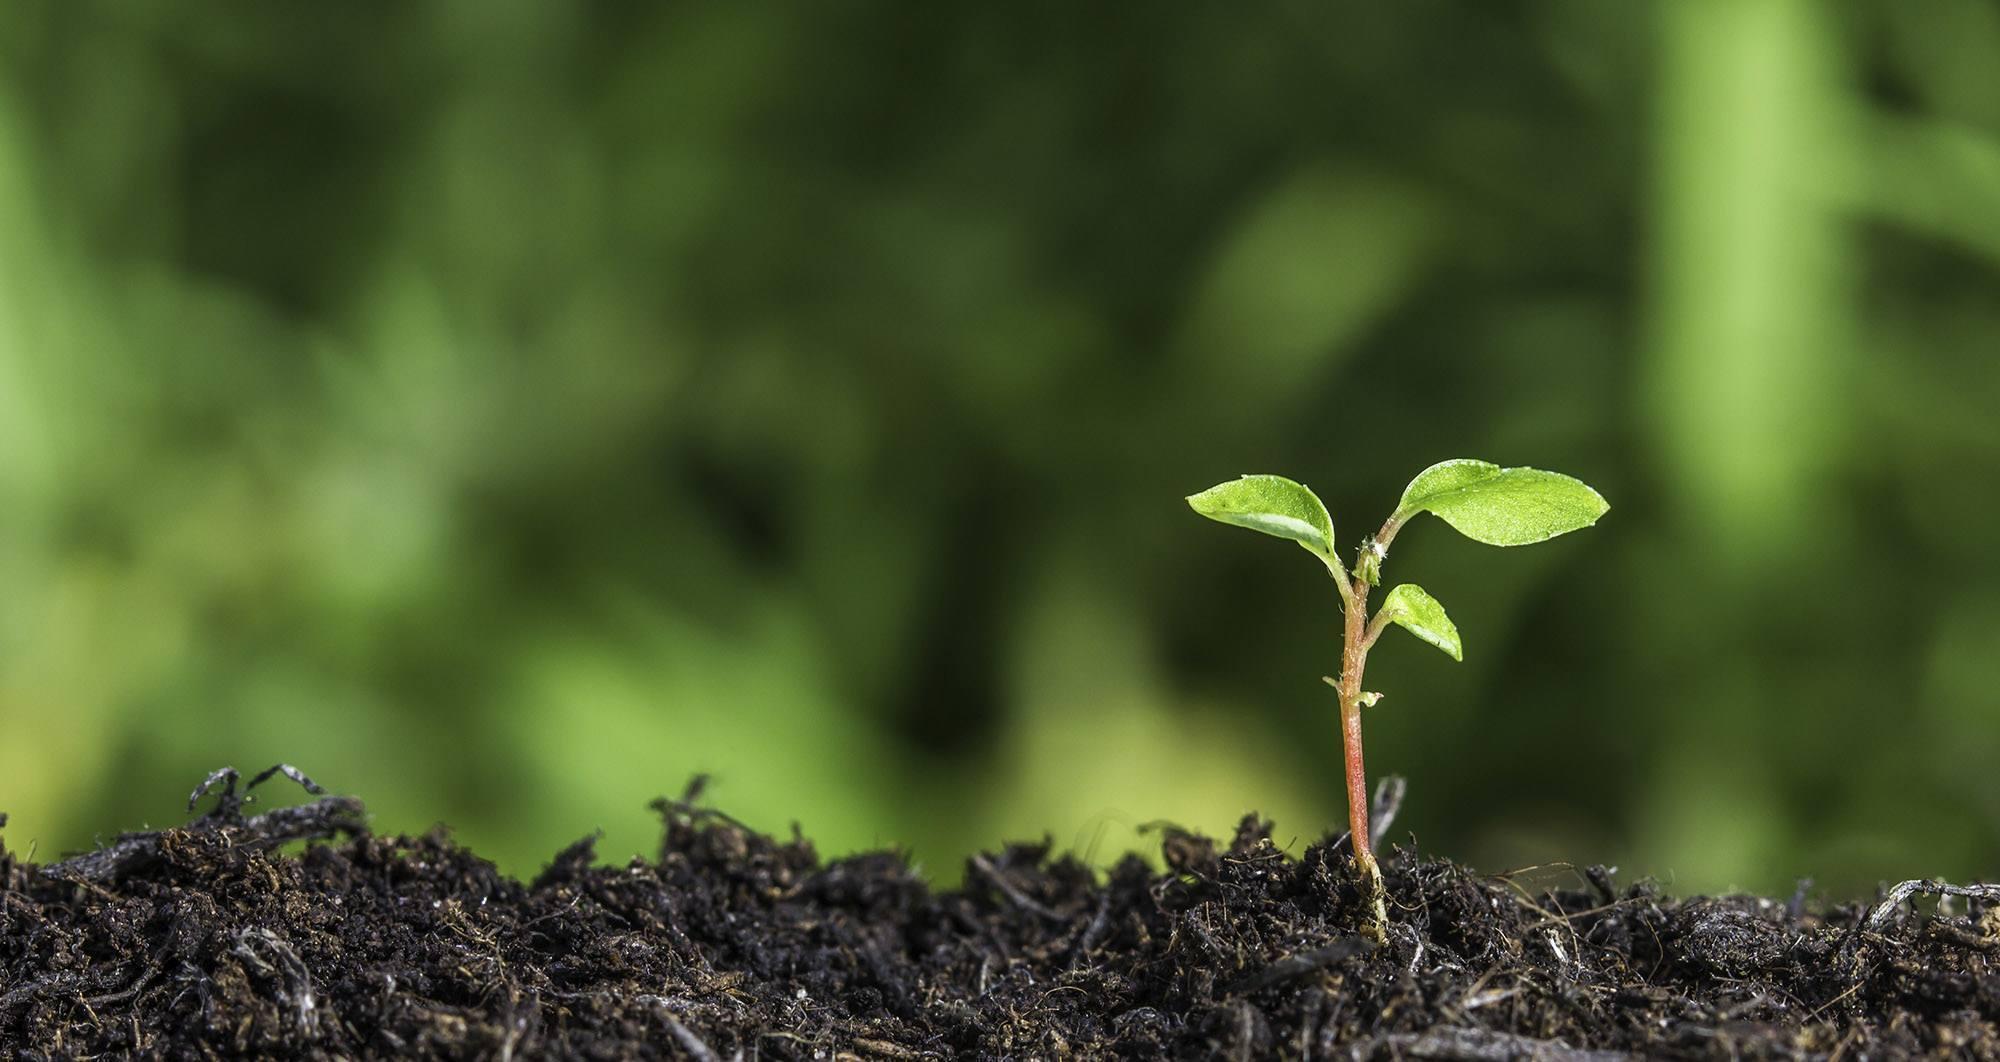 Comprehensive Evaluation of Effective Biomass Resource